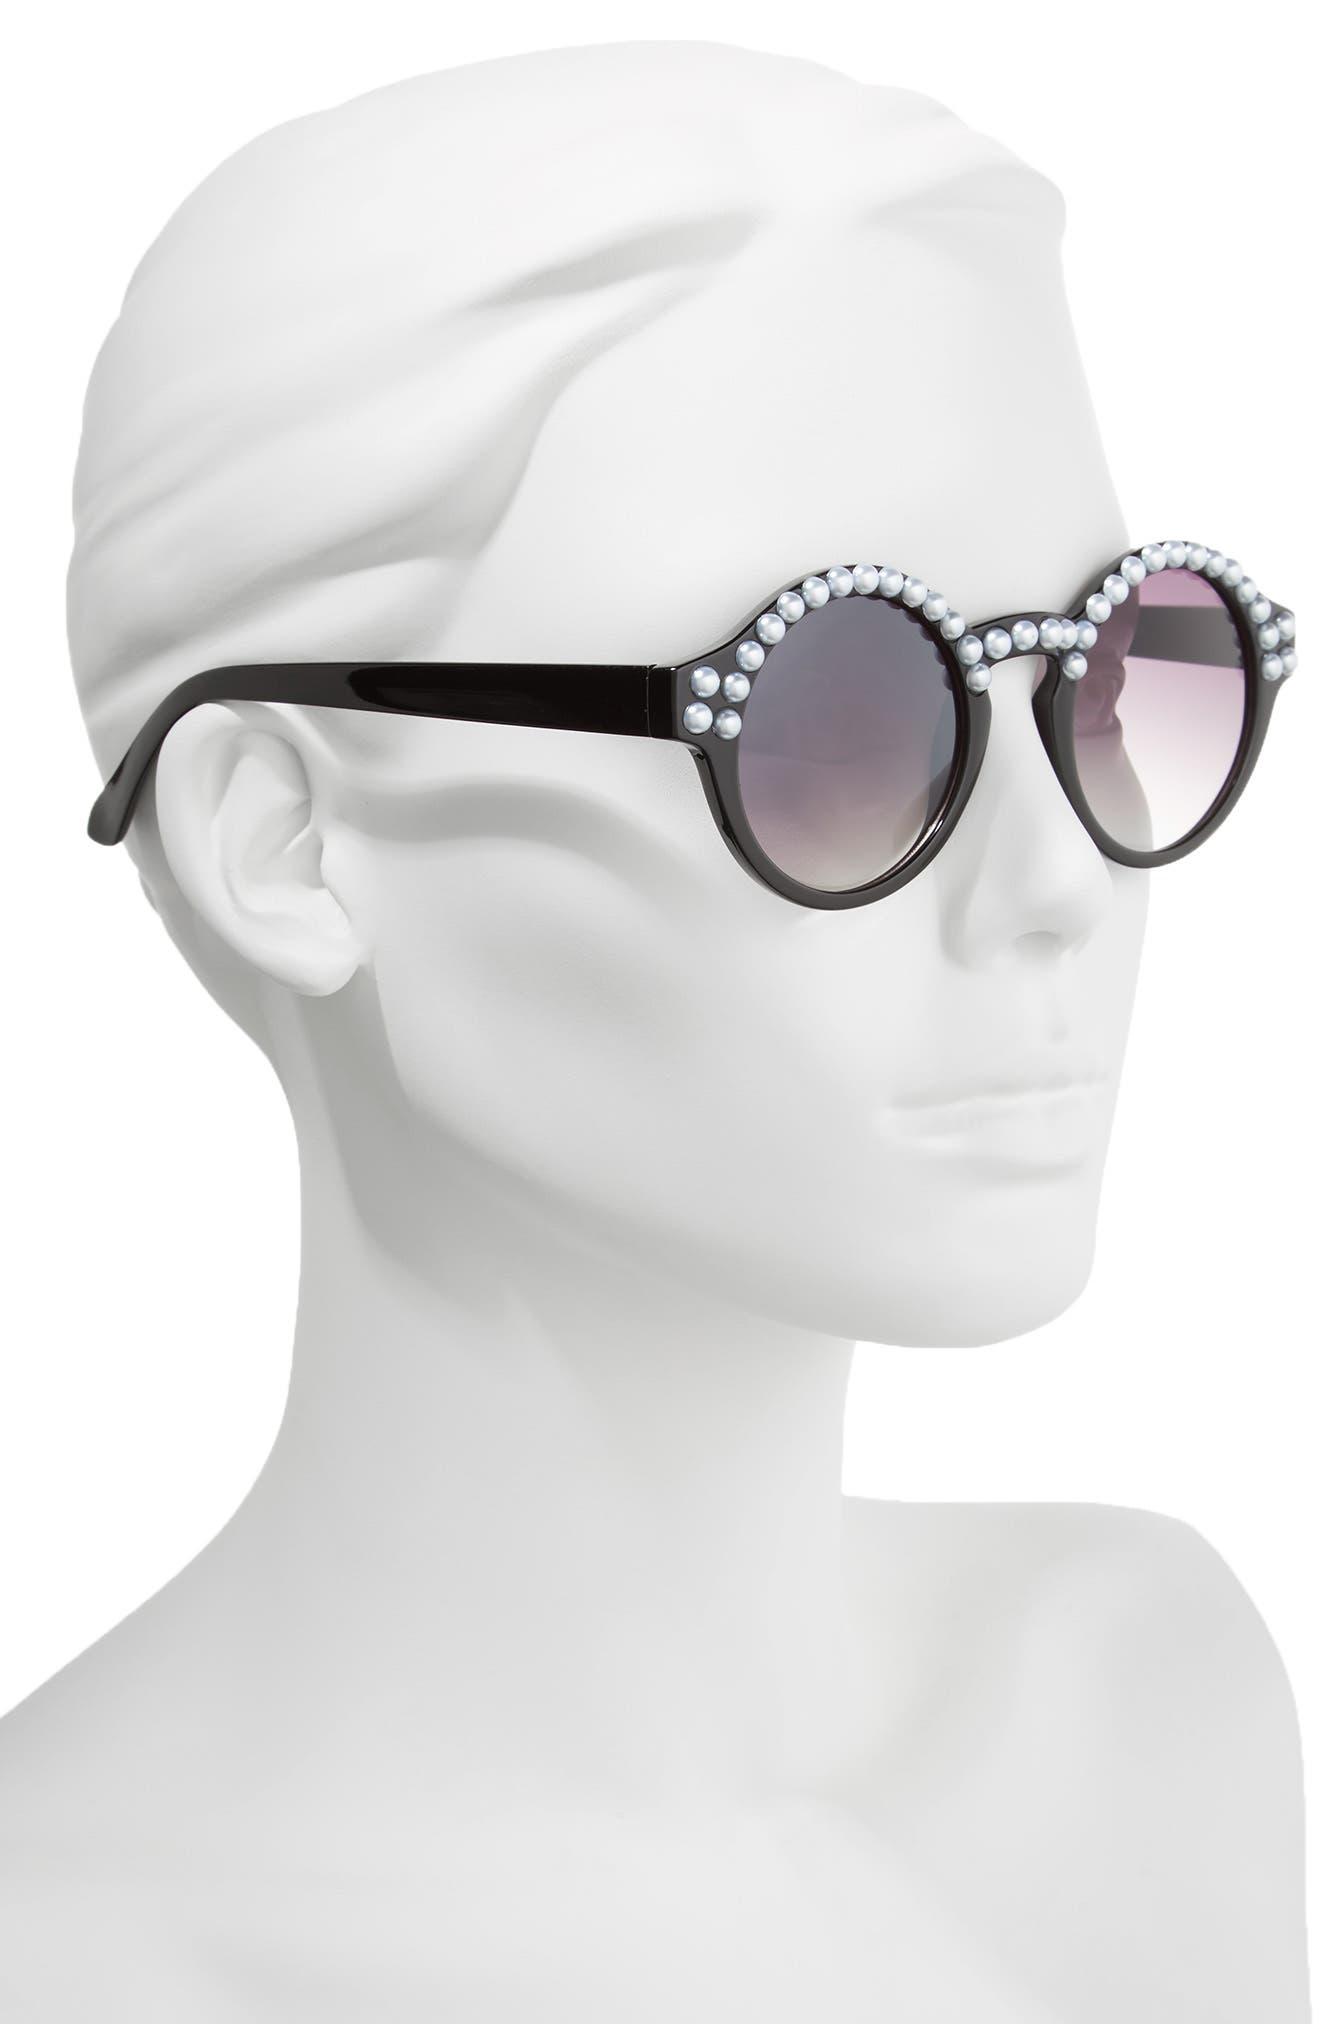 45mm Imitation Pearl Round Sunglasses,                             Alternate thumbnail 2, color,                             Black